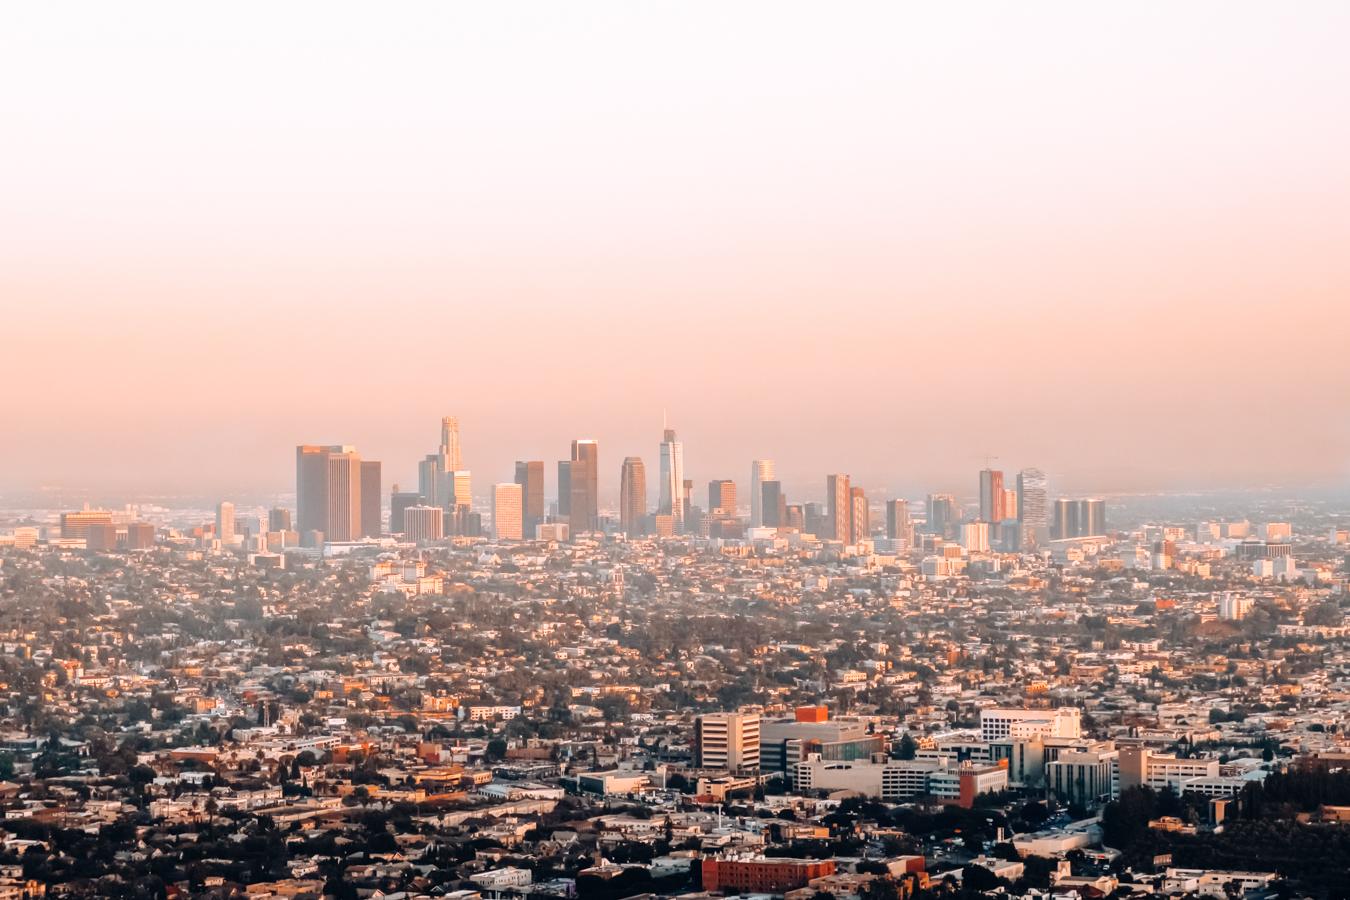 Instagrammable view of LA